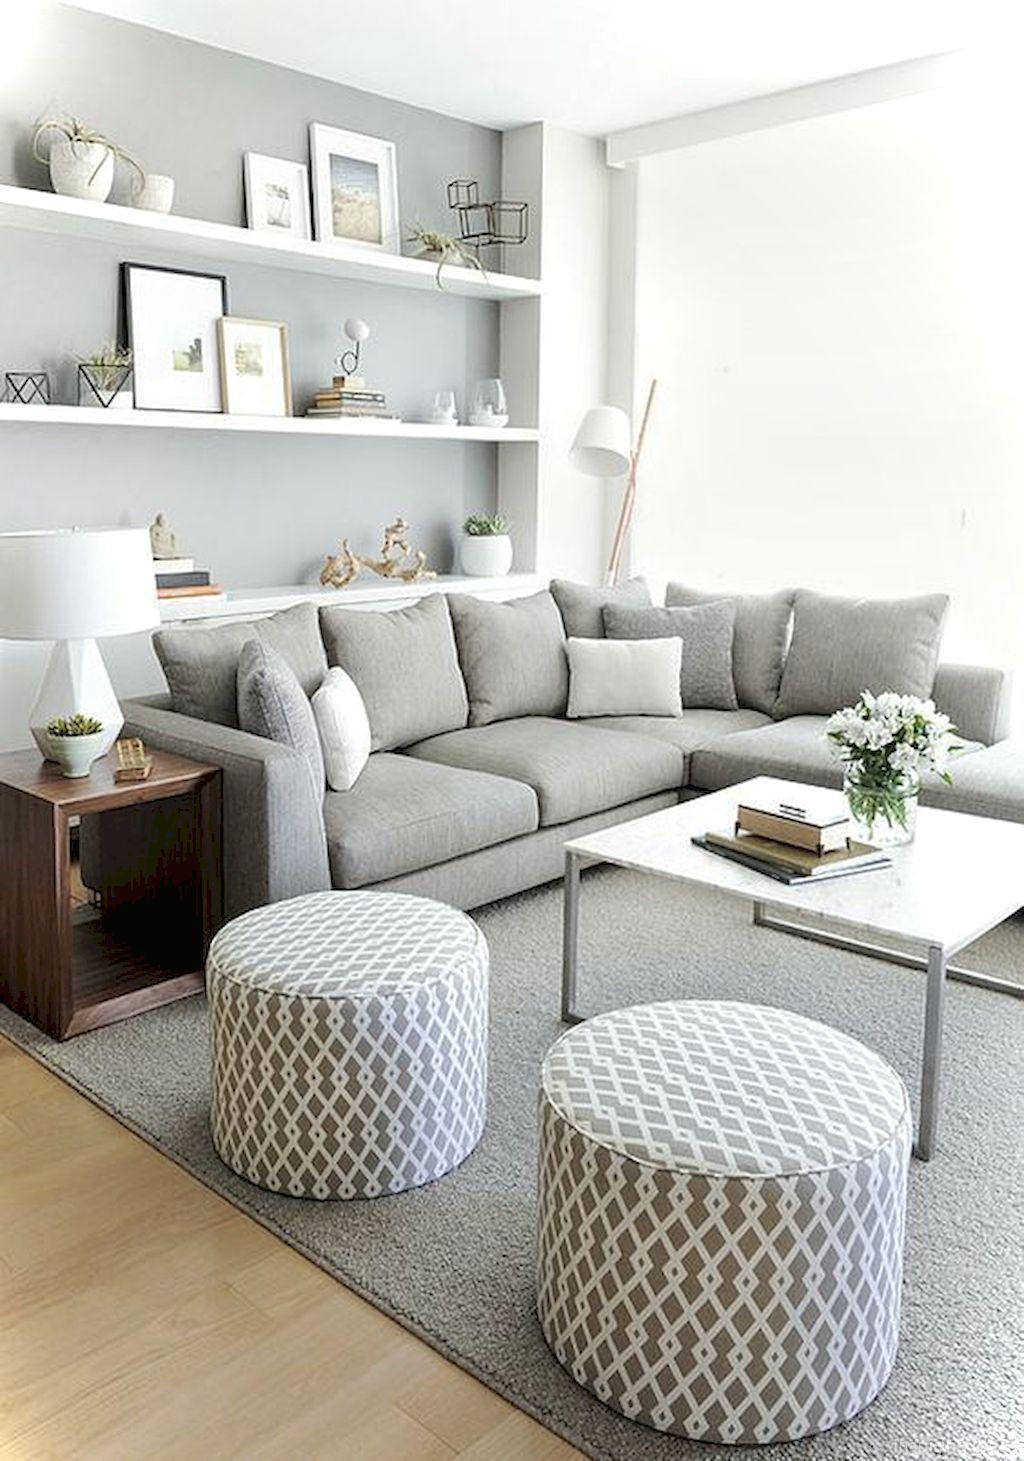 Cool 50 Best Apartment Living Room Decorating Ideas Https://roomaniac.com/